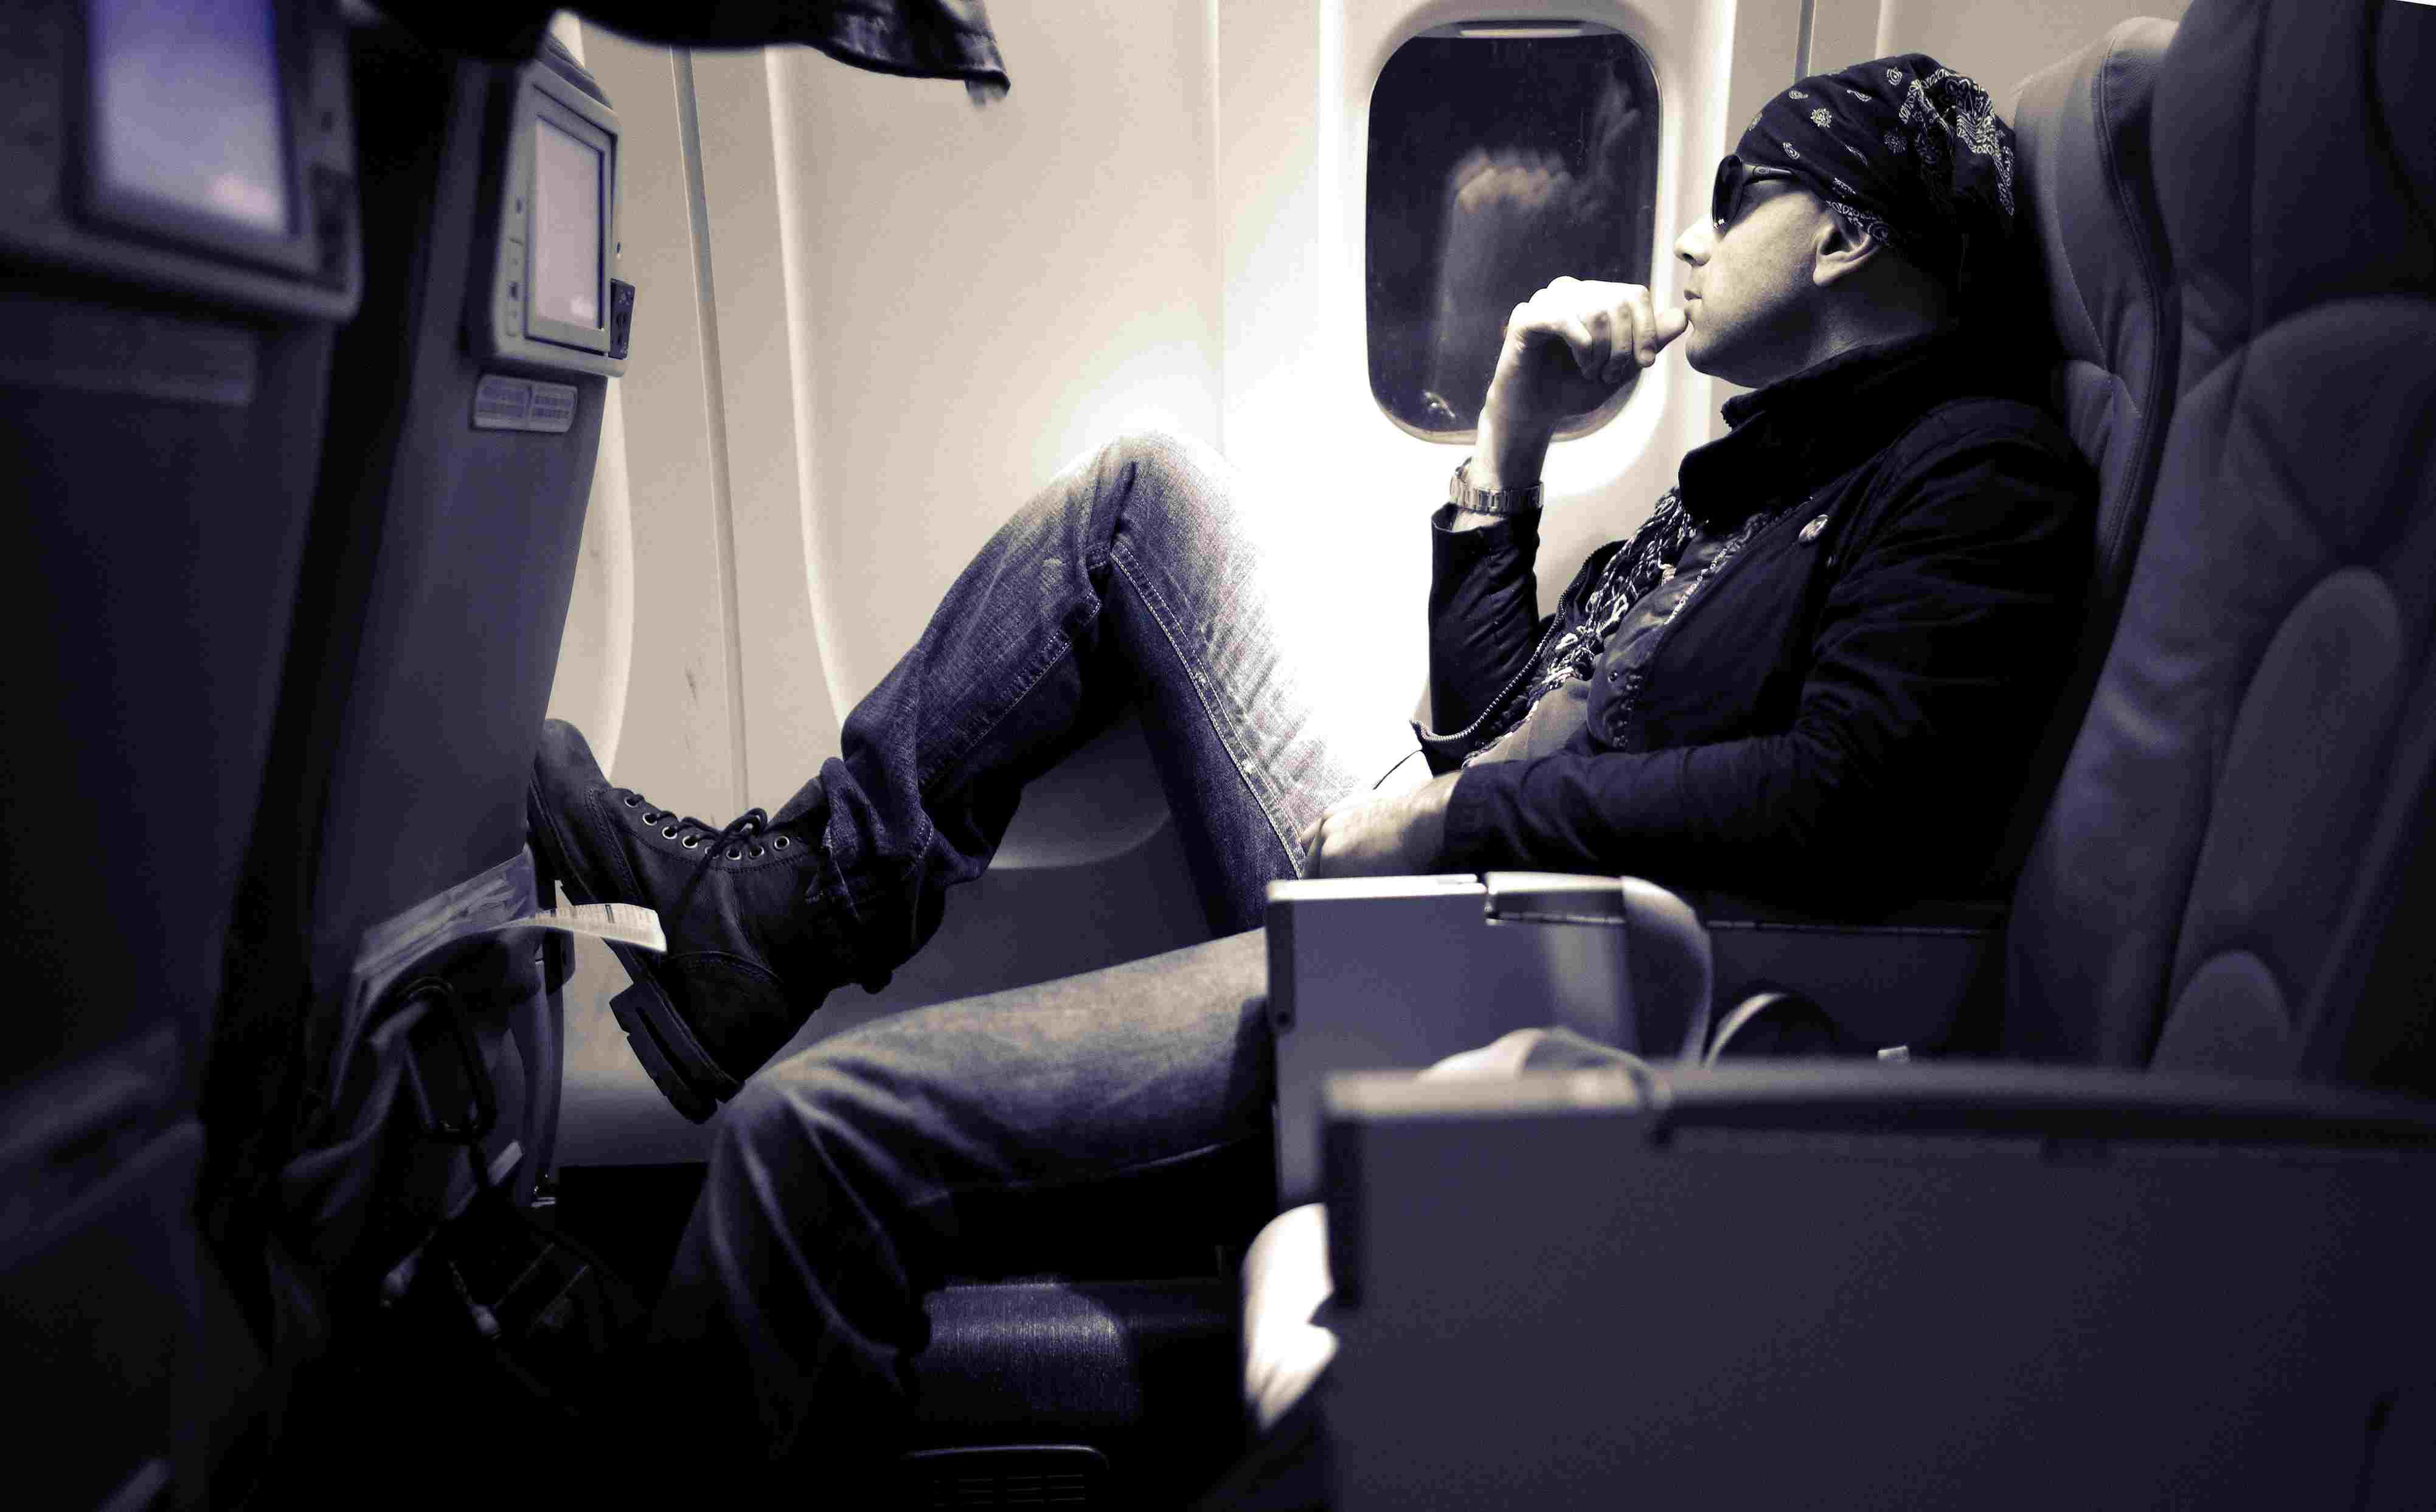 Man sitting in an airplane